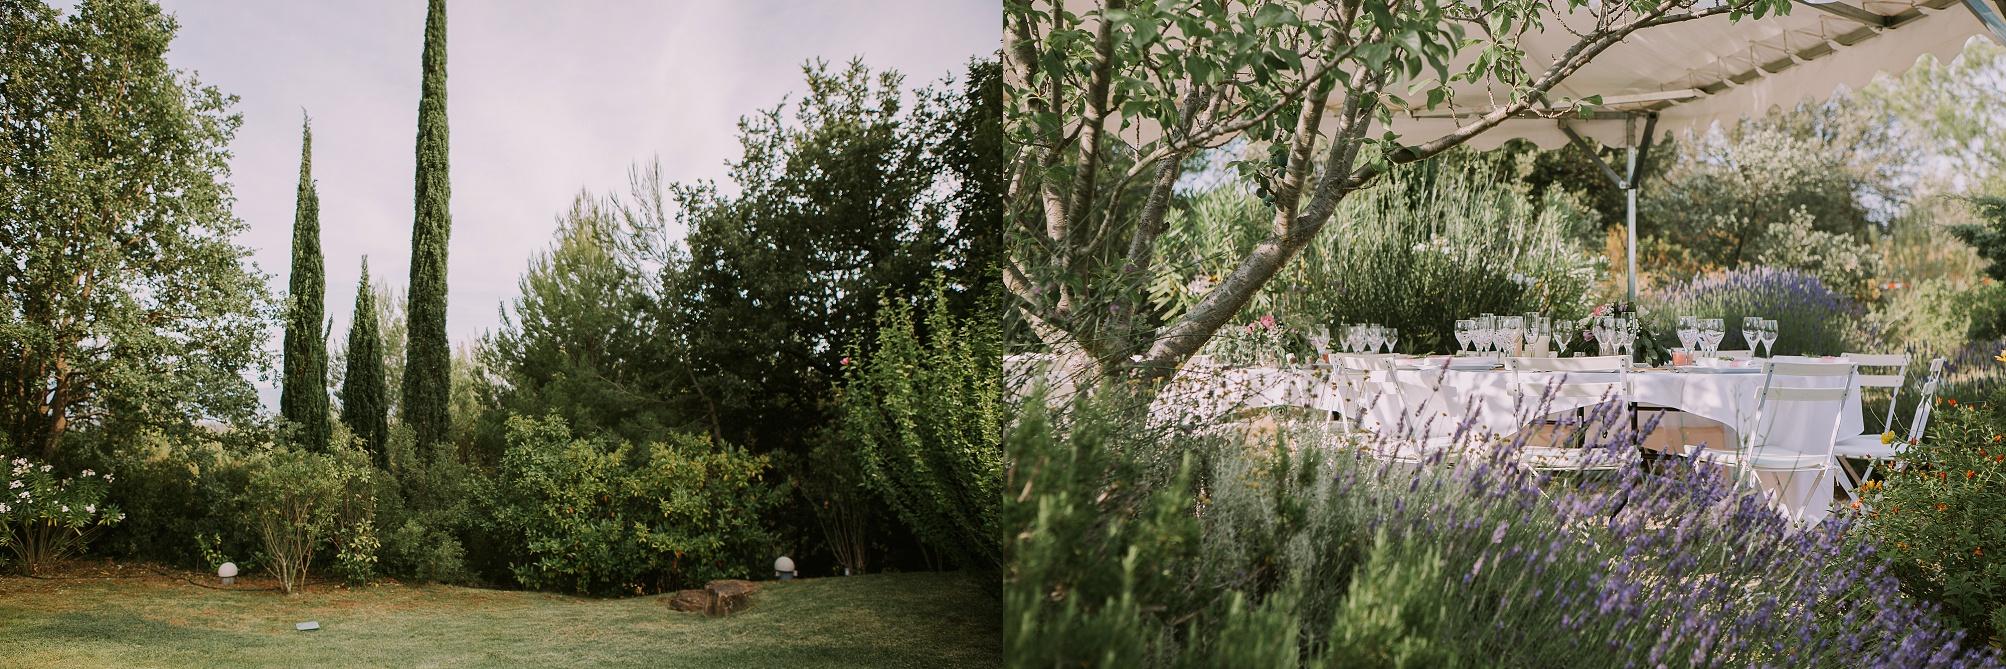 katerynaphotos-mariage-photographe-puyloubier-provence-aix-en-provence-sud-de-la-france_0413.jpg